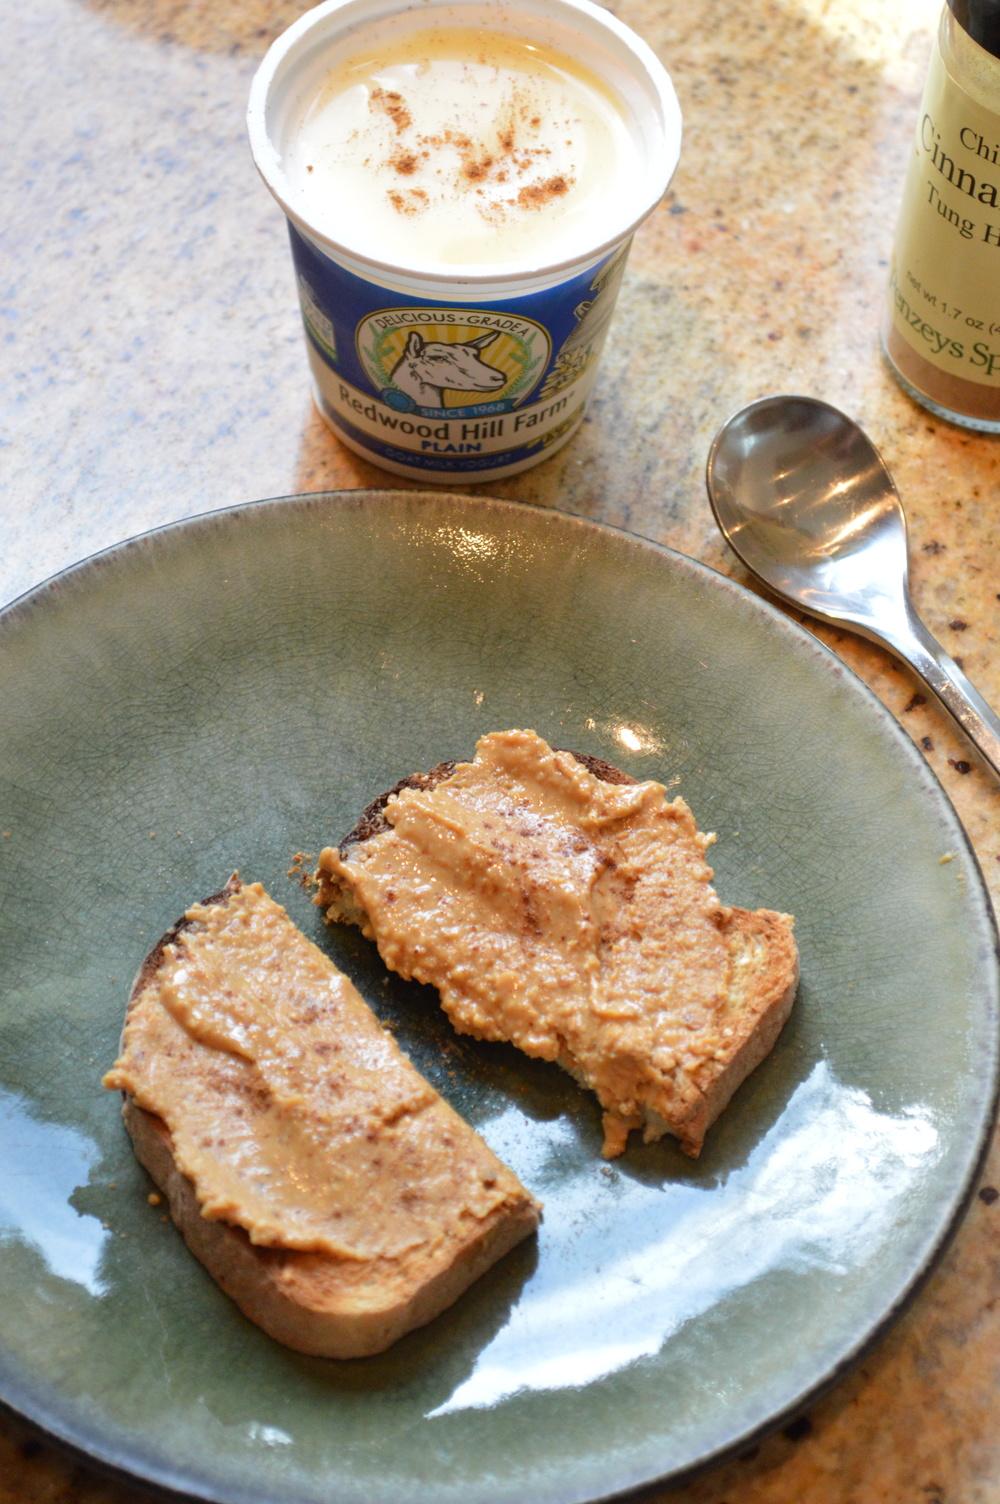 LaurenSchwaiger-Healthy-Life-Style-Blog-Gluten-Free-Breakfast.jpg